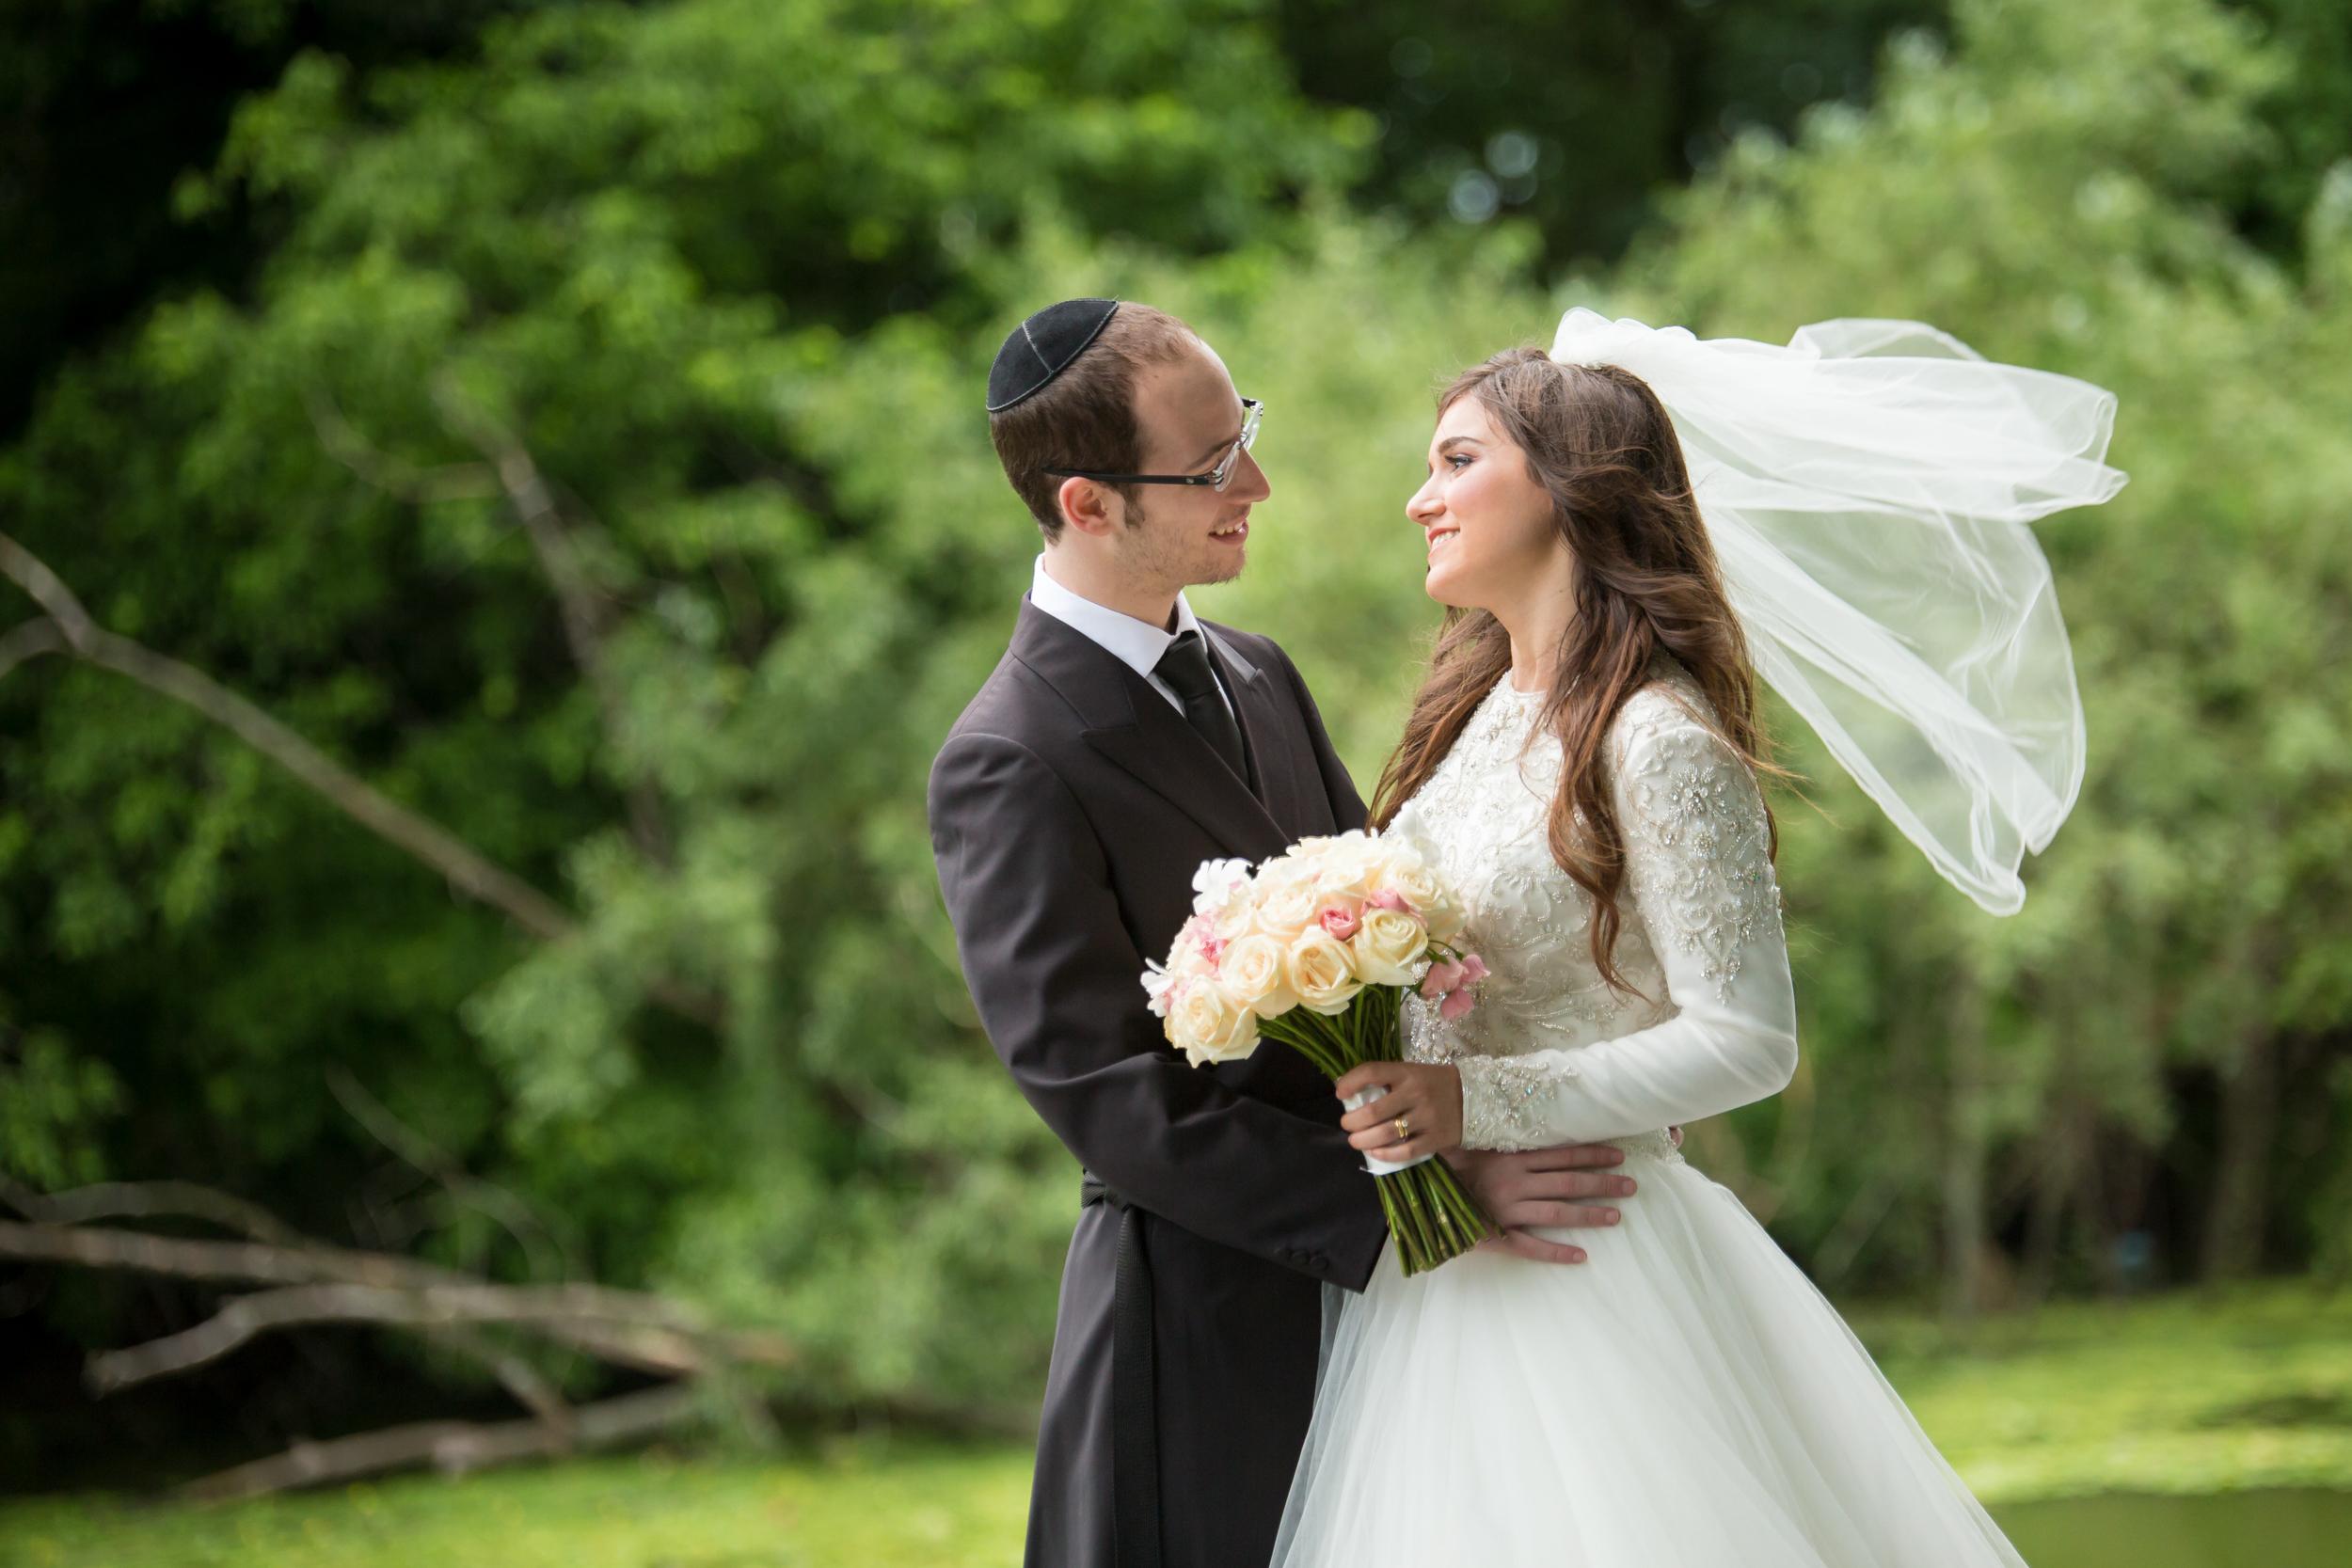 Wedding Iossi and Gitty Khafif  - Eliau Piha studio photography, new york, events, people 770 brooklyn -0692.jpg